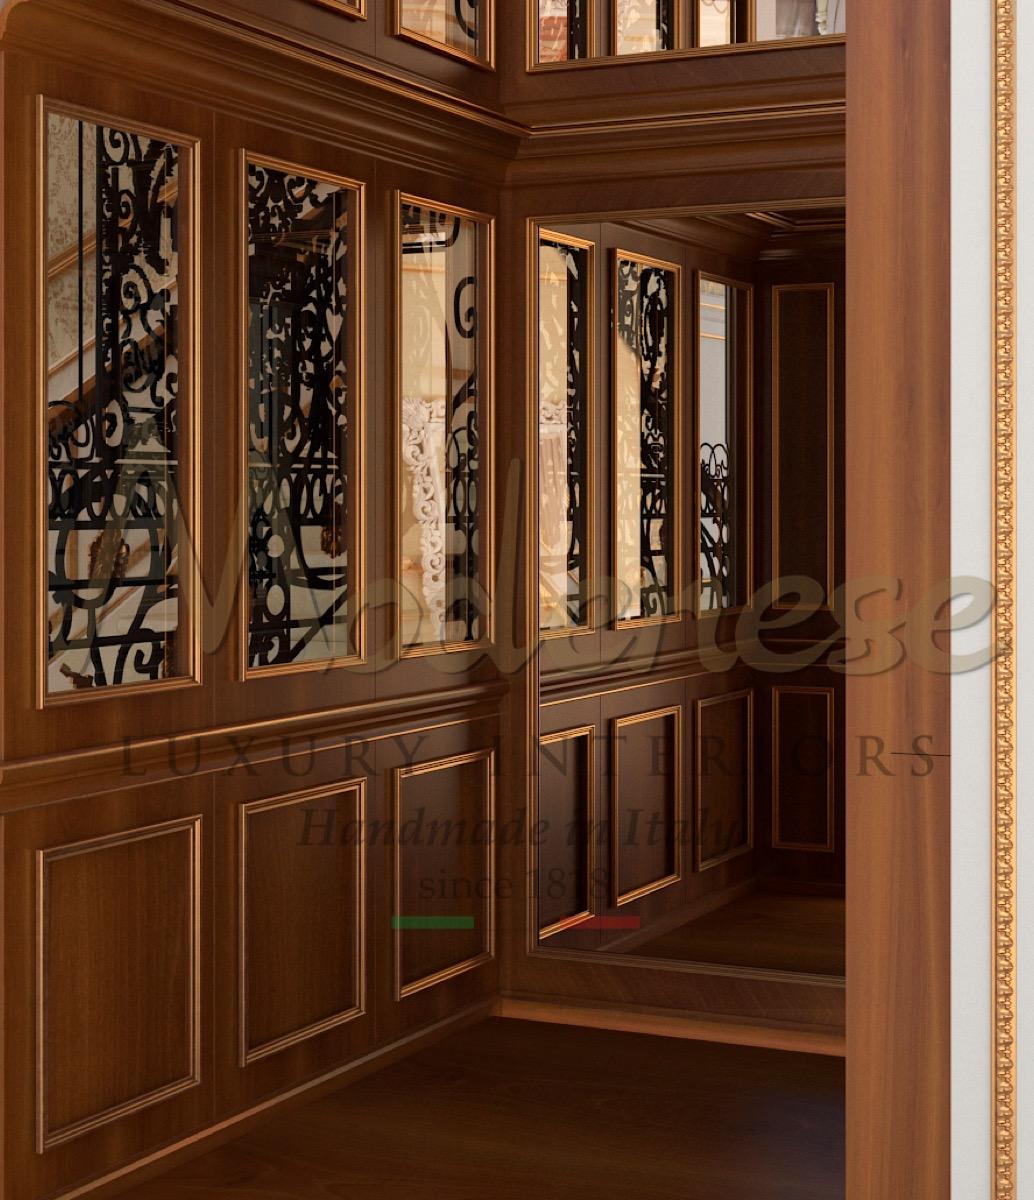 Bespoke interior design project and artisanal furniture production, refined majestic home decoration, amazing interior design classic villa, unique timeless elevator design, top lift designs.